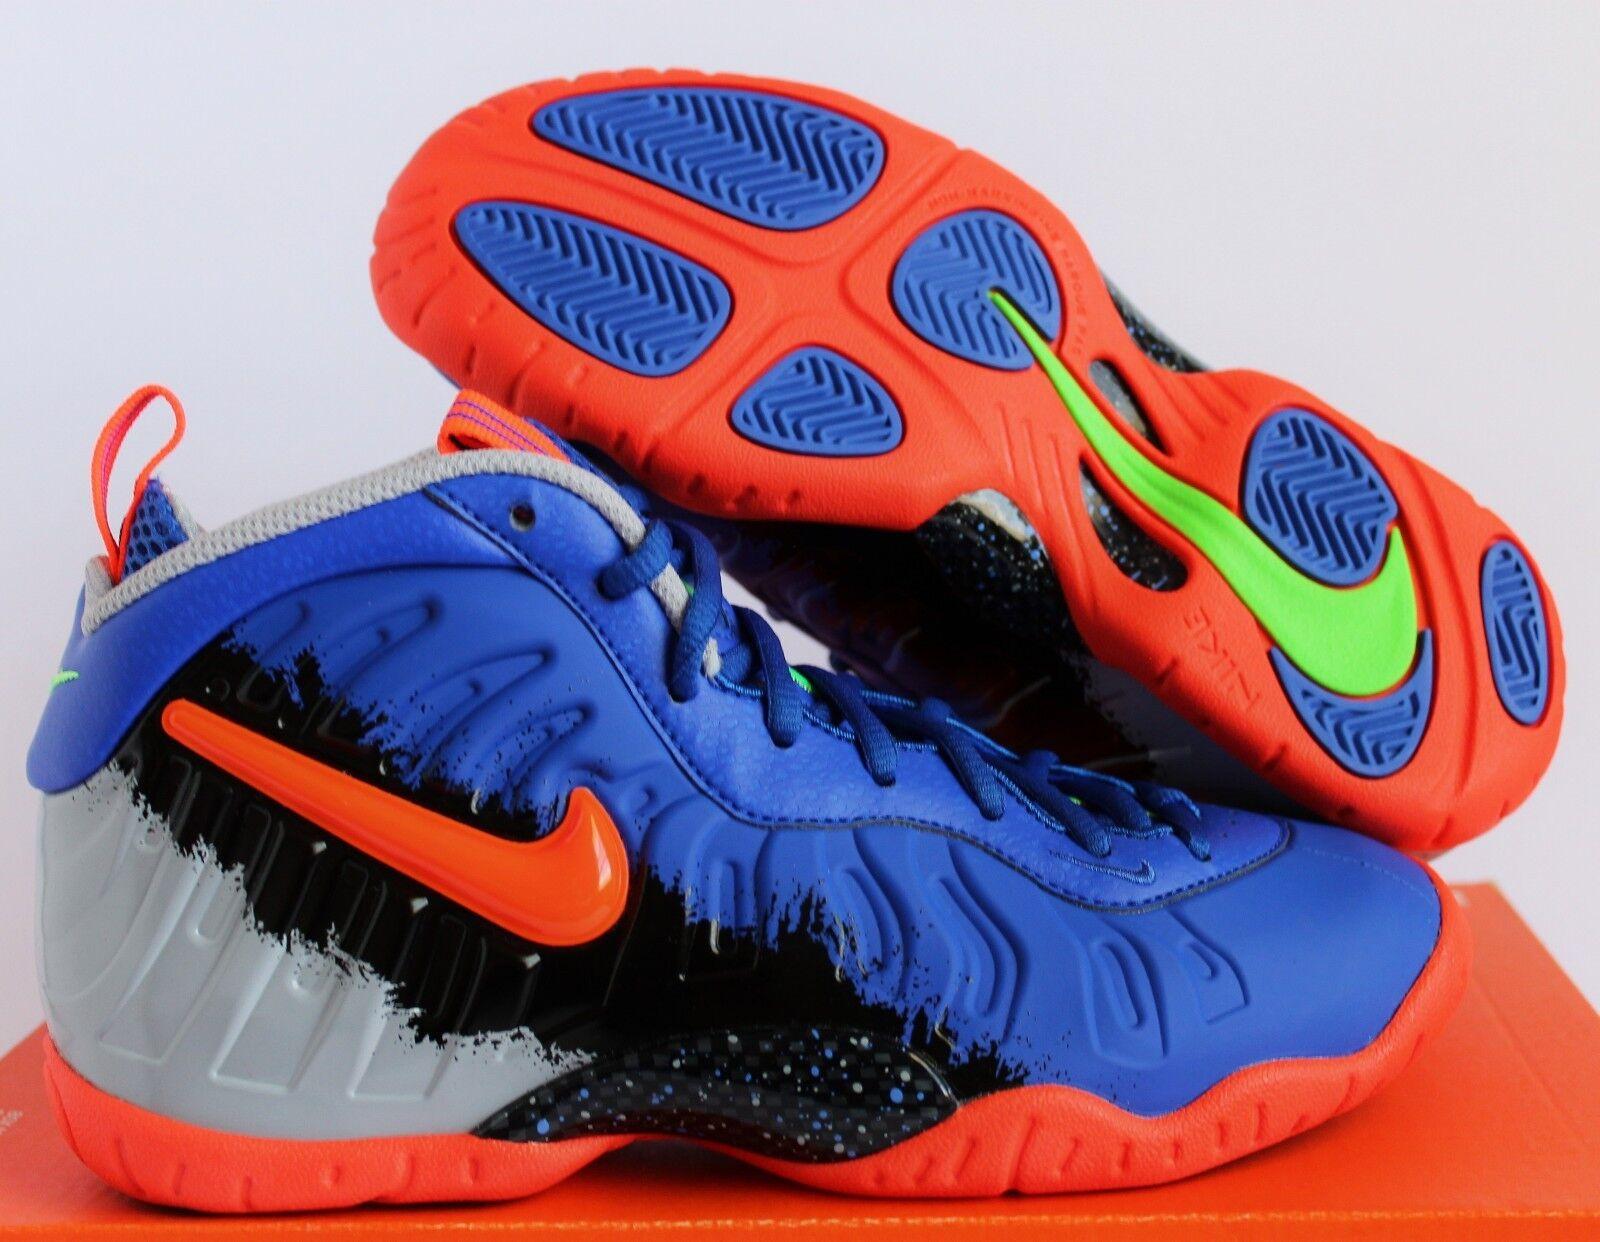 Nike poco Posite Pro (GS) (GS) (GS) Racer Azul-carmesí talla 5.5Y - Para Mujer Talla 7  muy popular